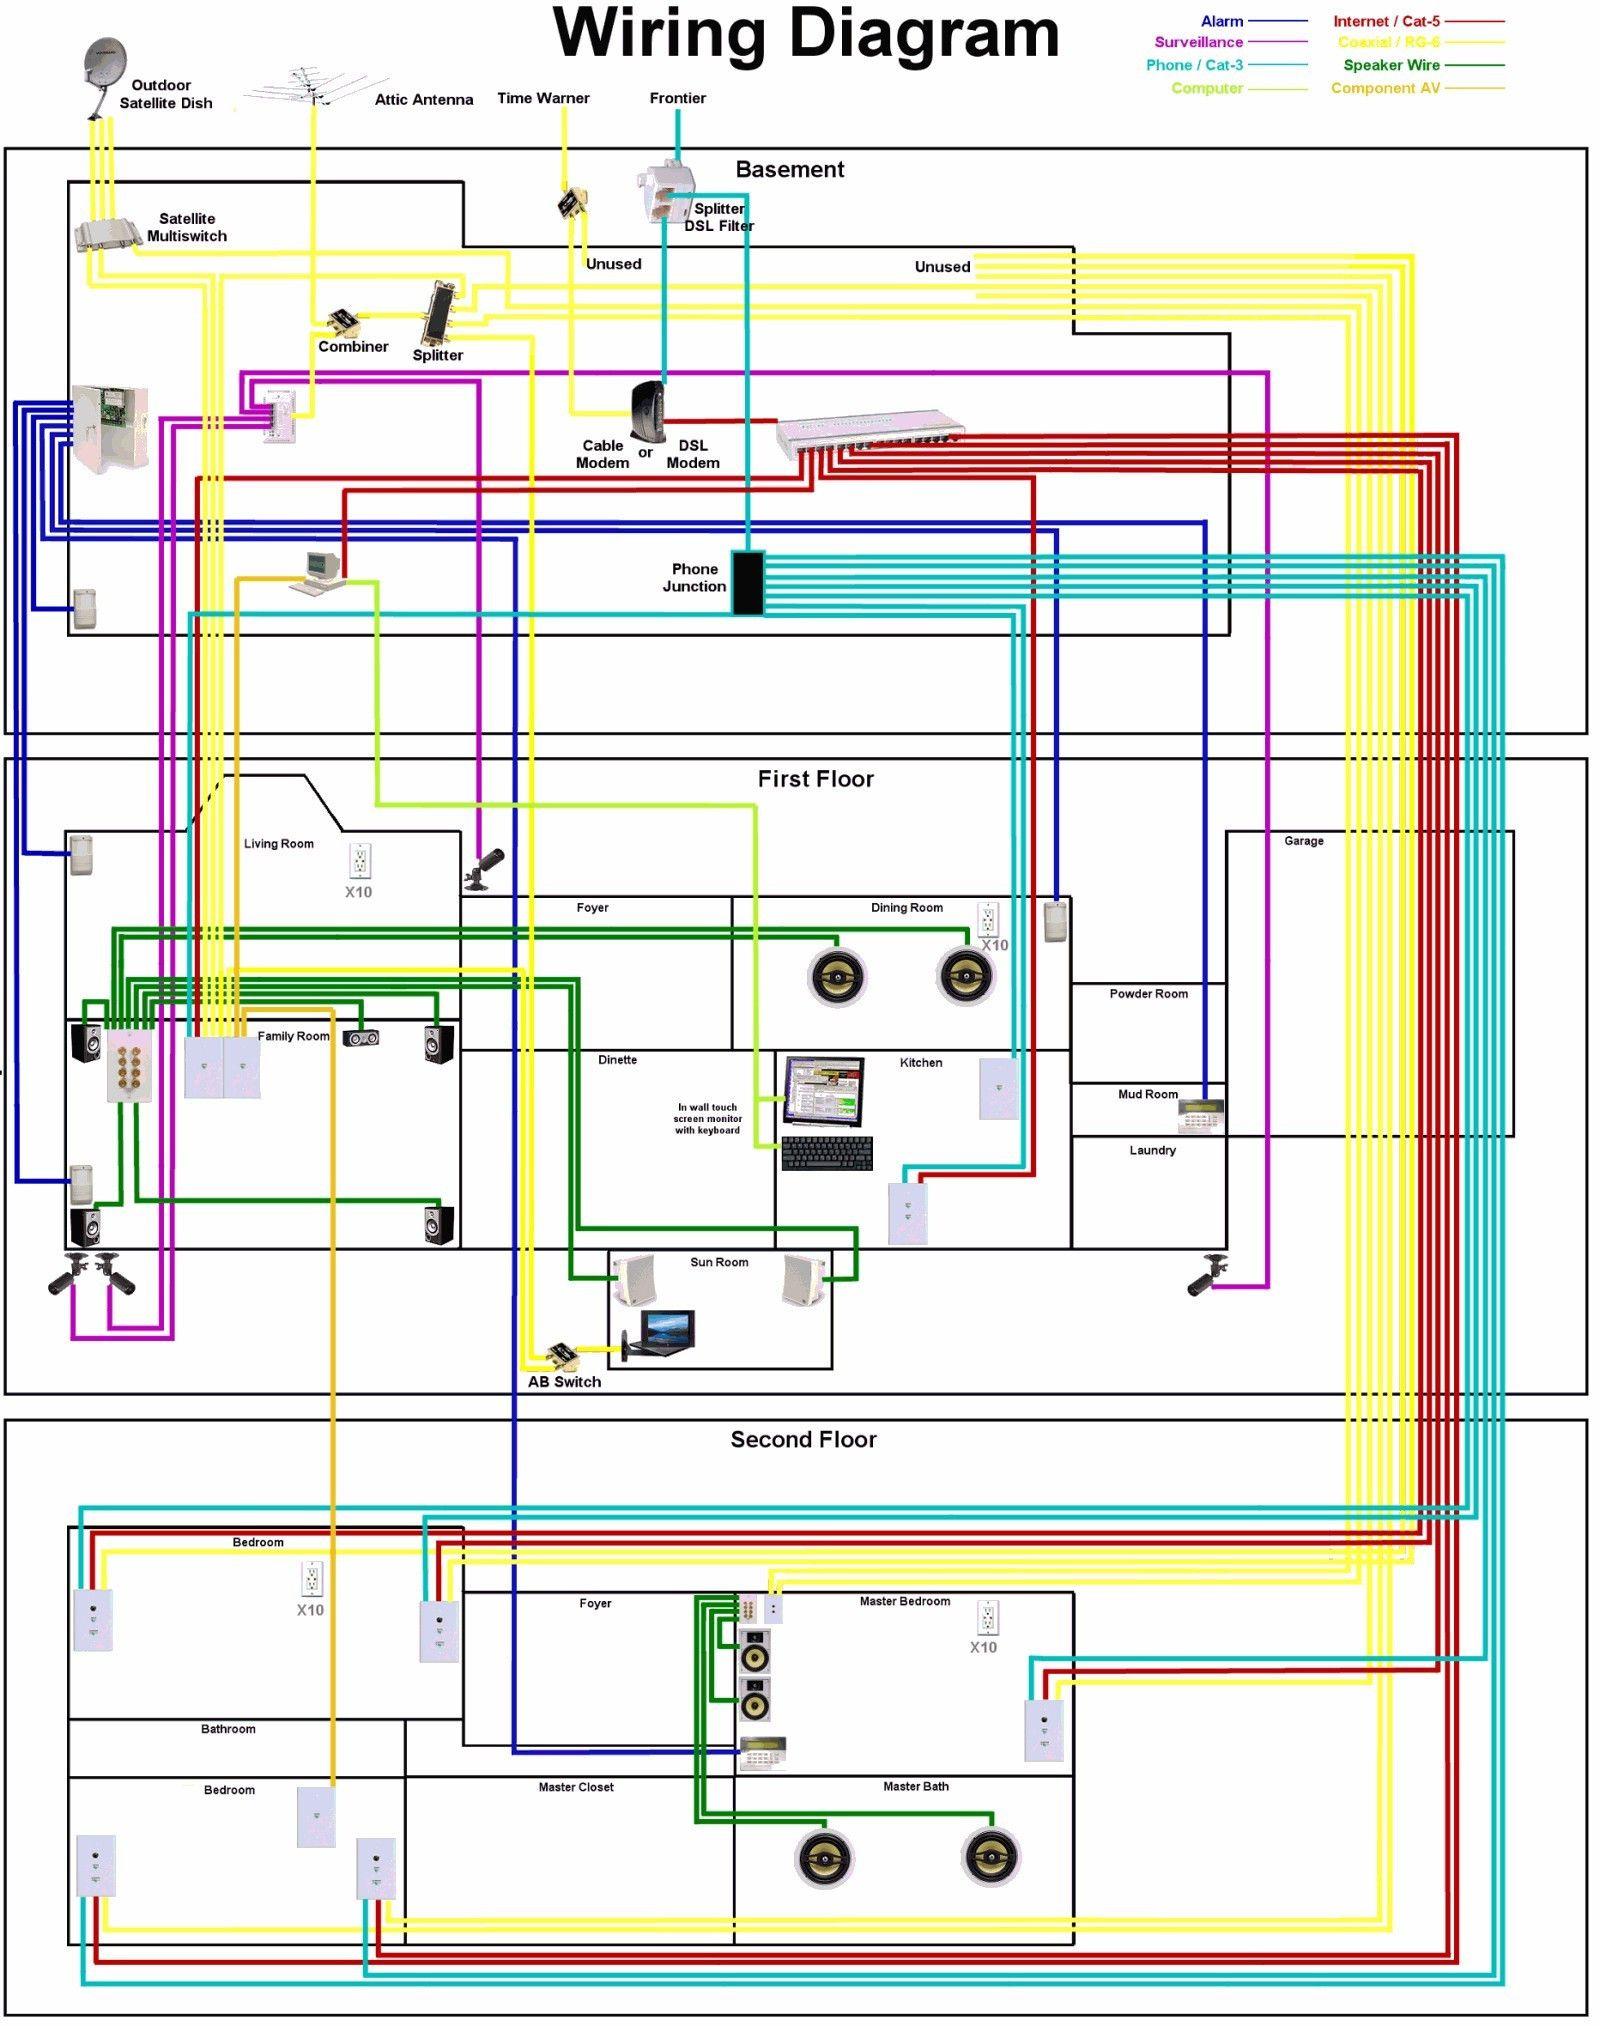 26 Best Sample Of Free Electrical Wiring Diagram Software Https Bacamajalah Com 26 Best Sample Of Fre Home Electrical Wiring House Wiring Electrical Wiring